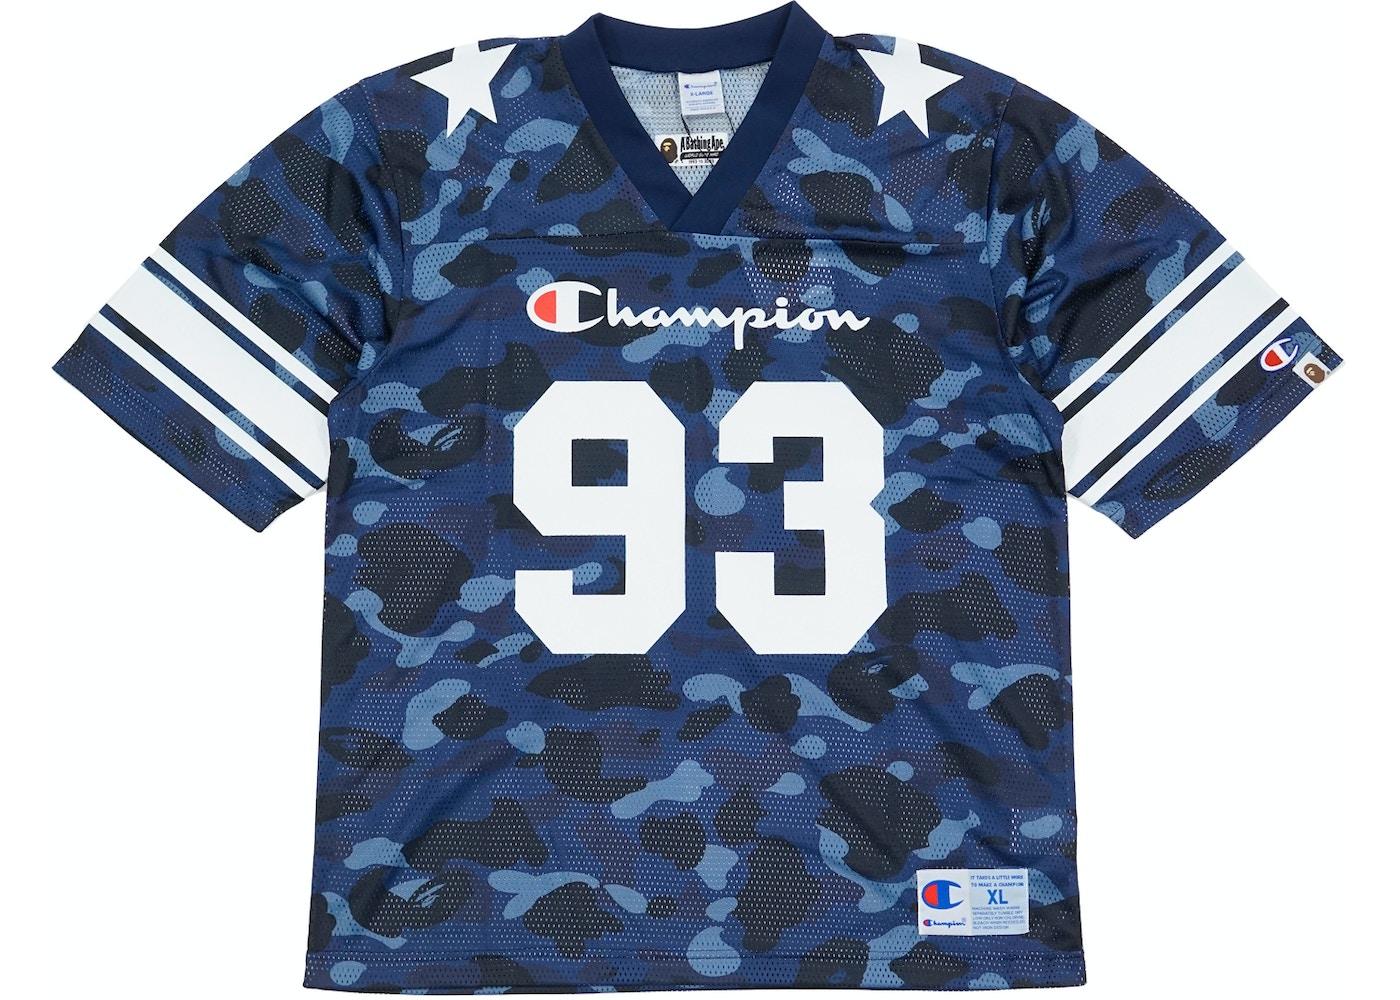 BAPE Champion Color Camo Football Jersey Navy - e2b8e19ce